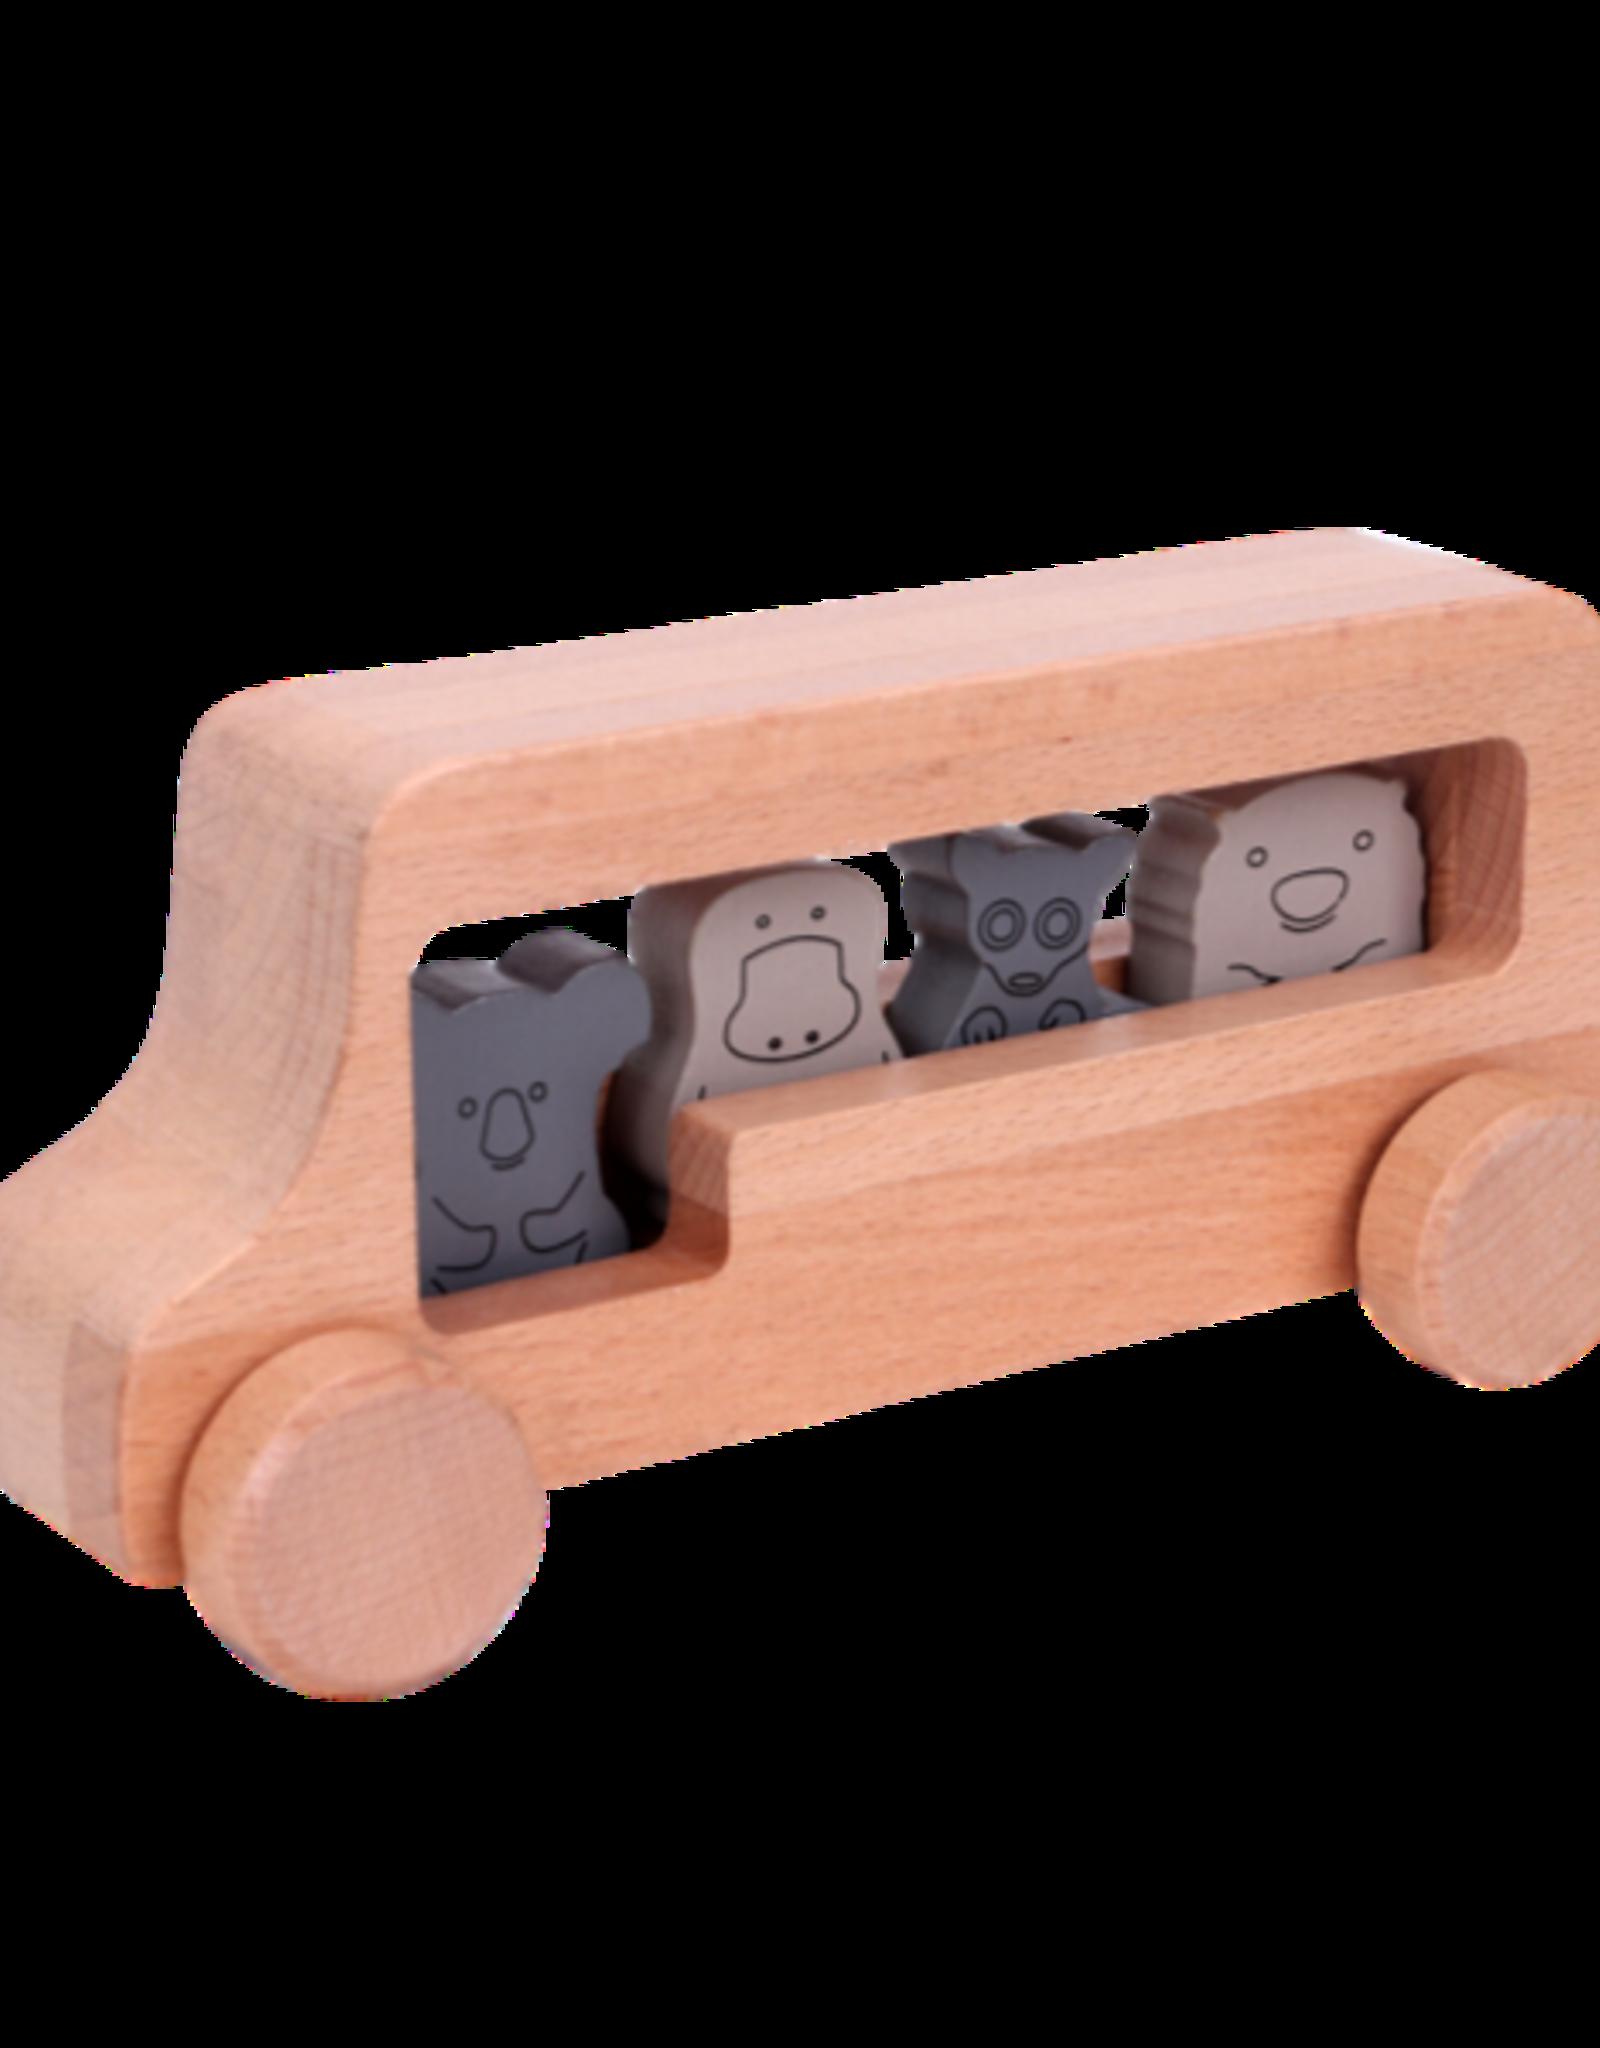 Discoveroo Discoveroo - Chunky Animal Bus